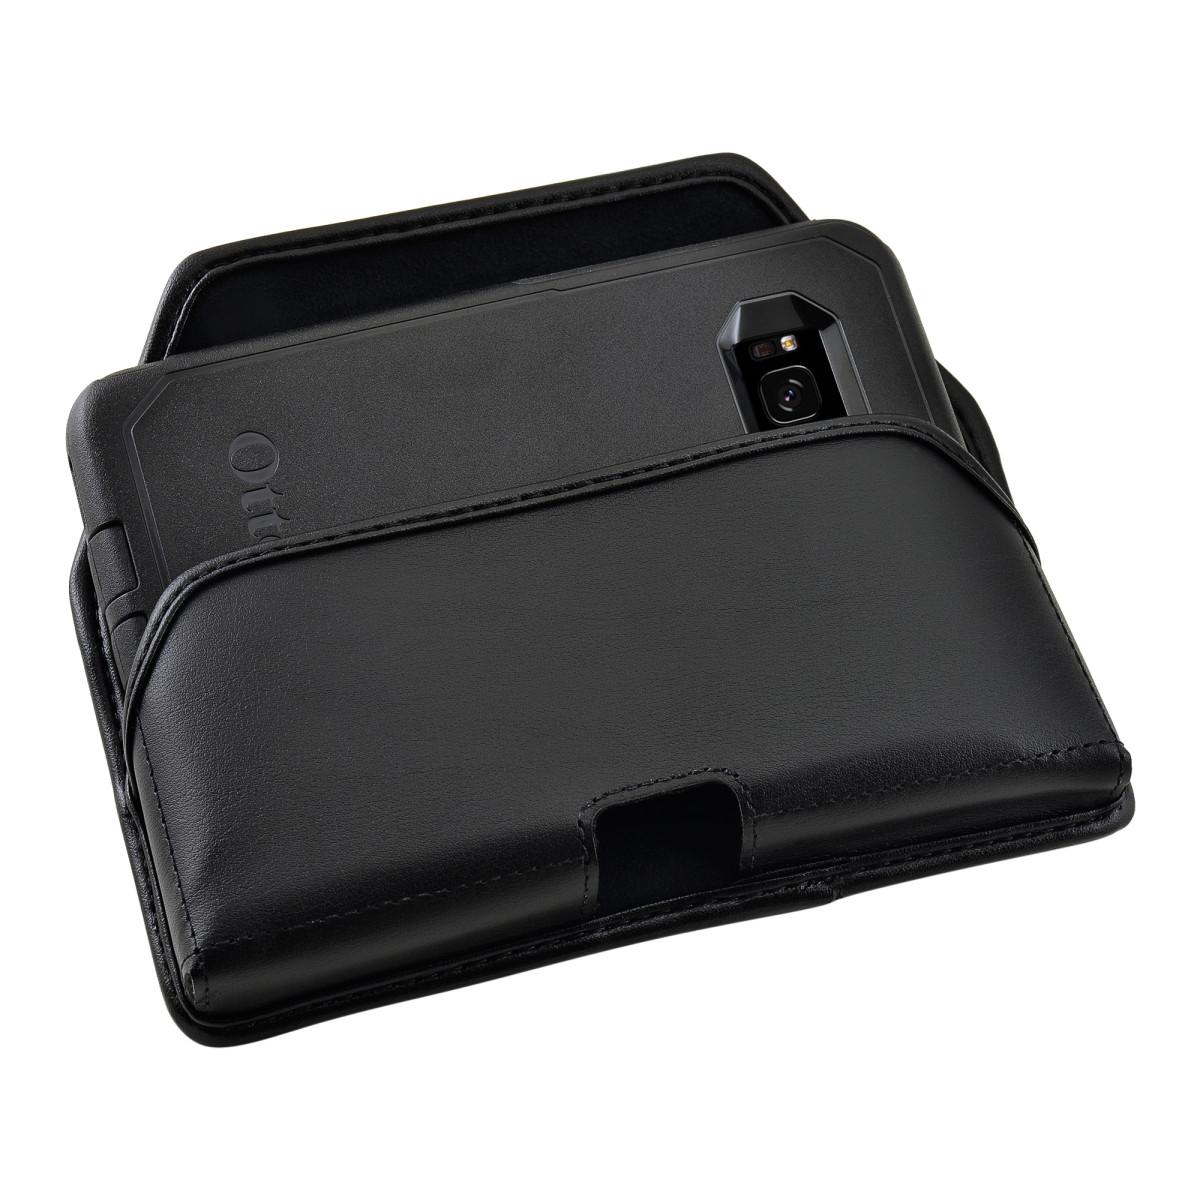 online retailer b8d40 93609 Galaxy S8 Holster Black Belt Clip Otterbox Commuter Leather